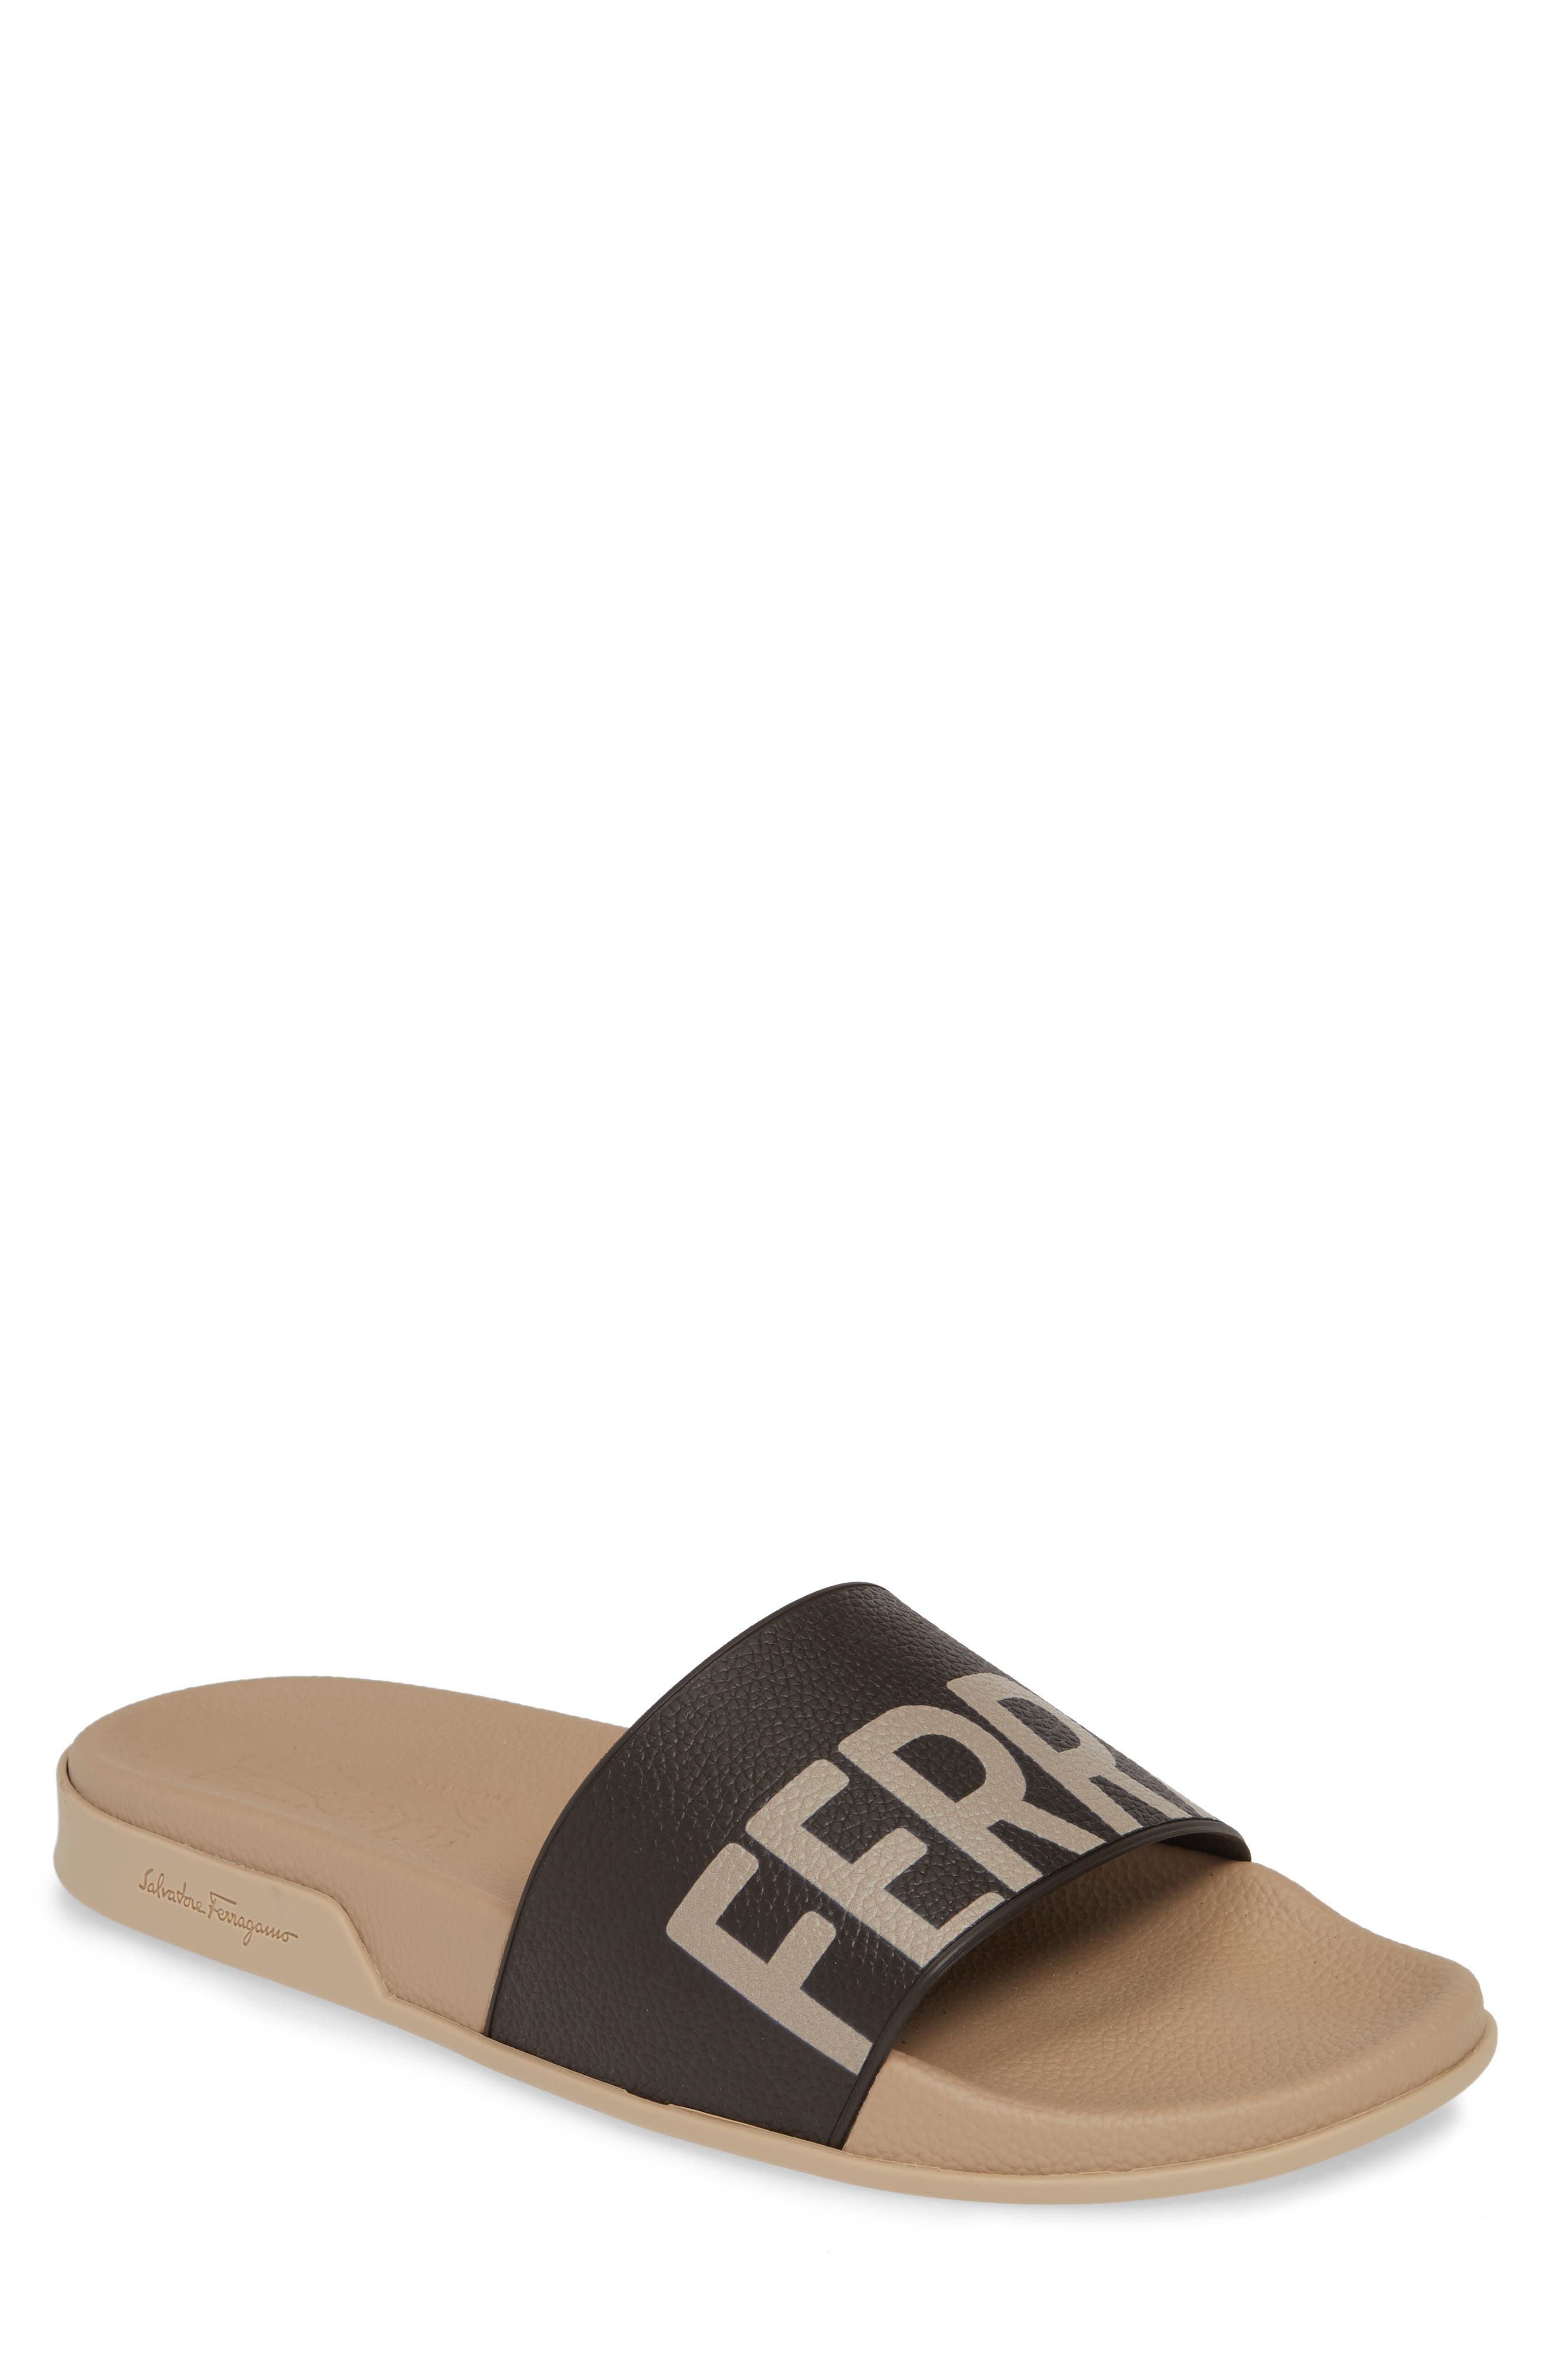 cbf490eebf9b Men s Salvatore Ferragamo Sandals